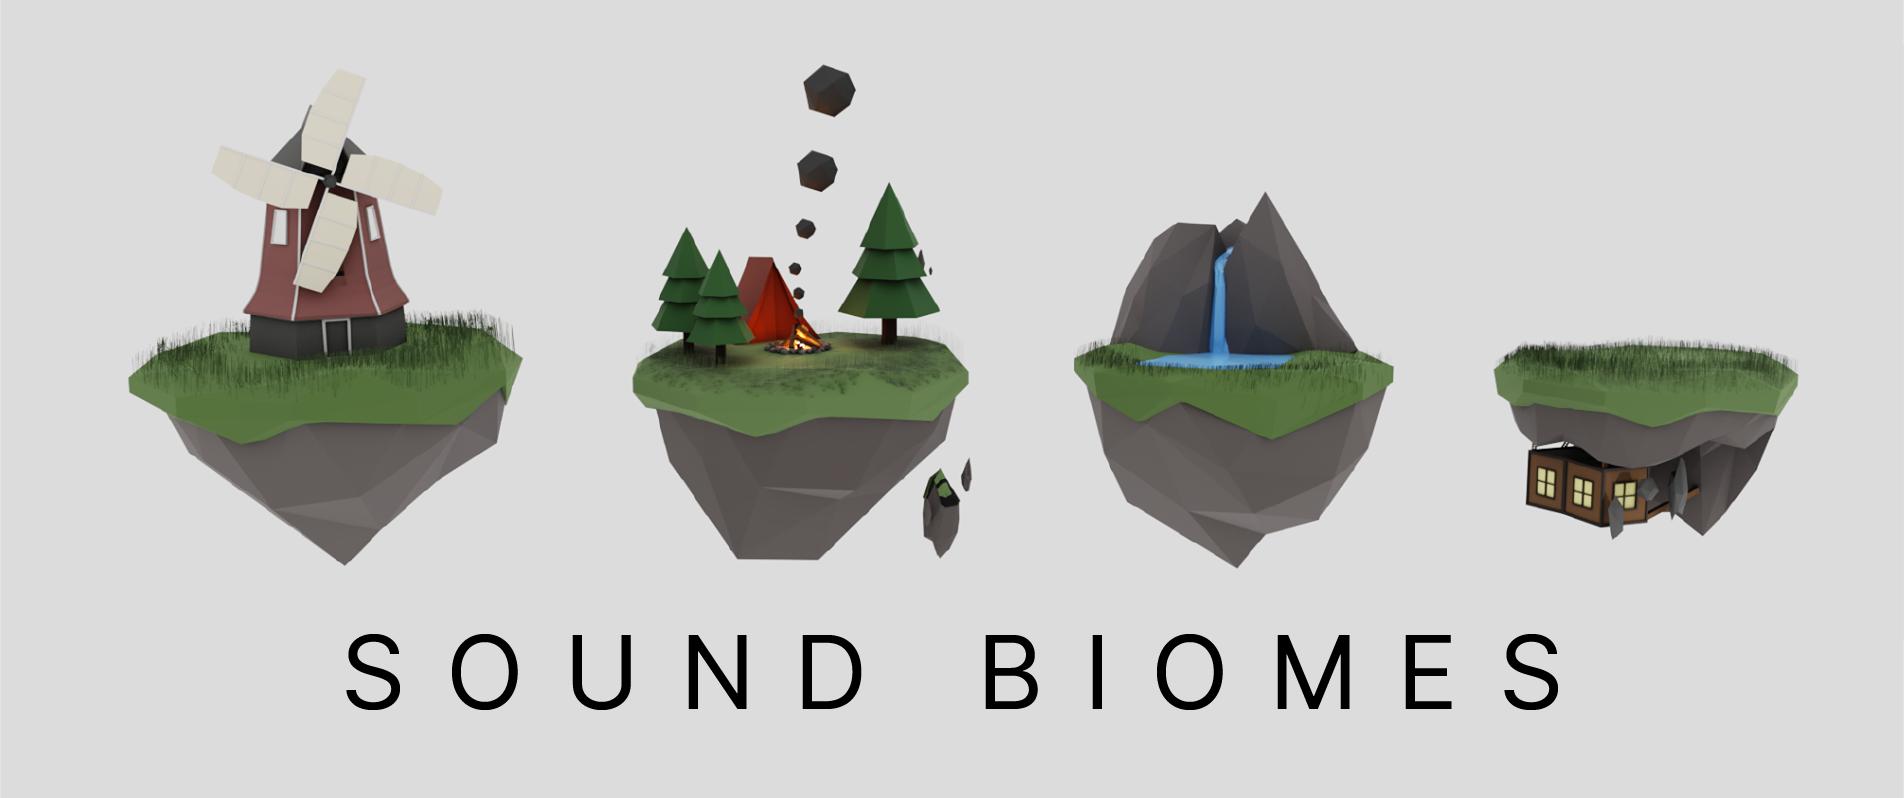 Sound Biomes